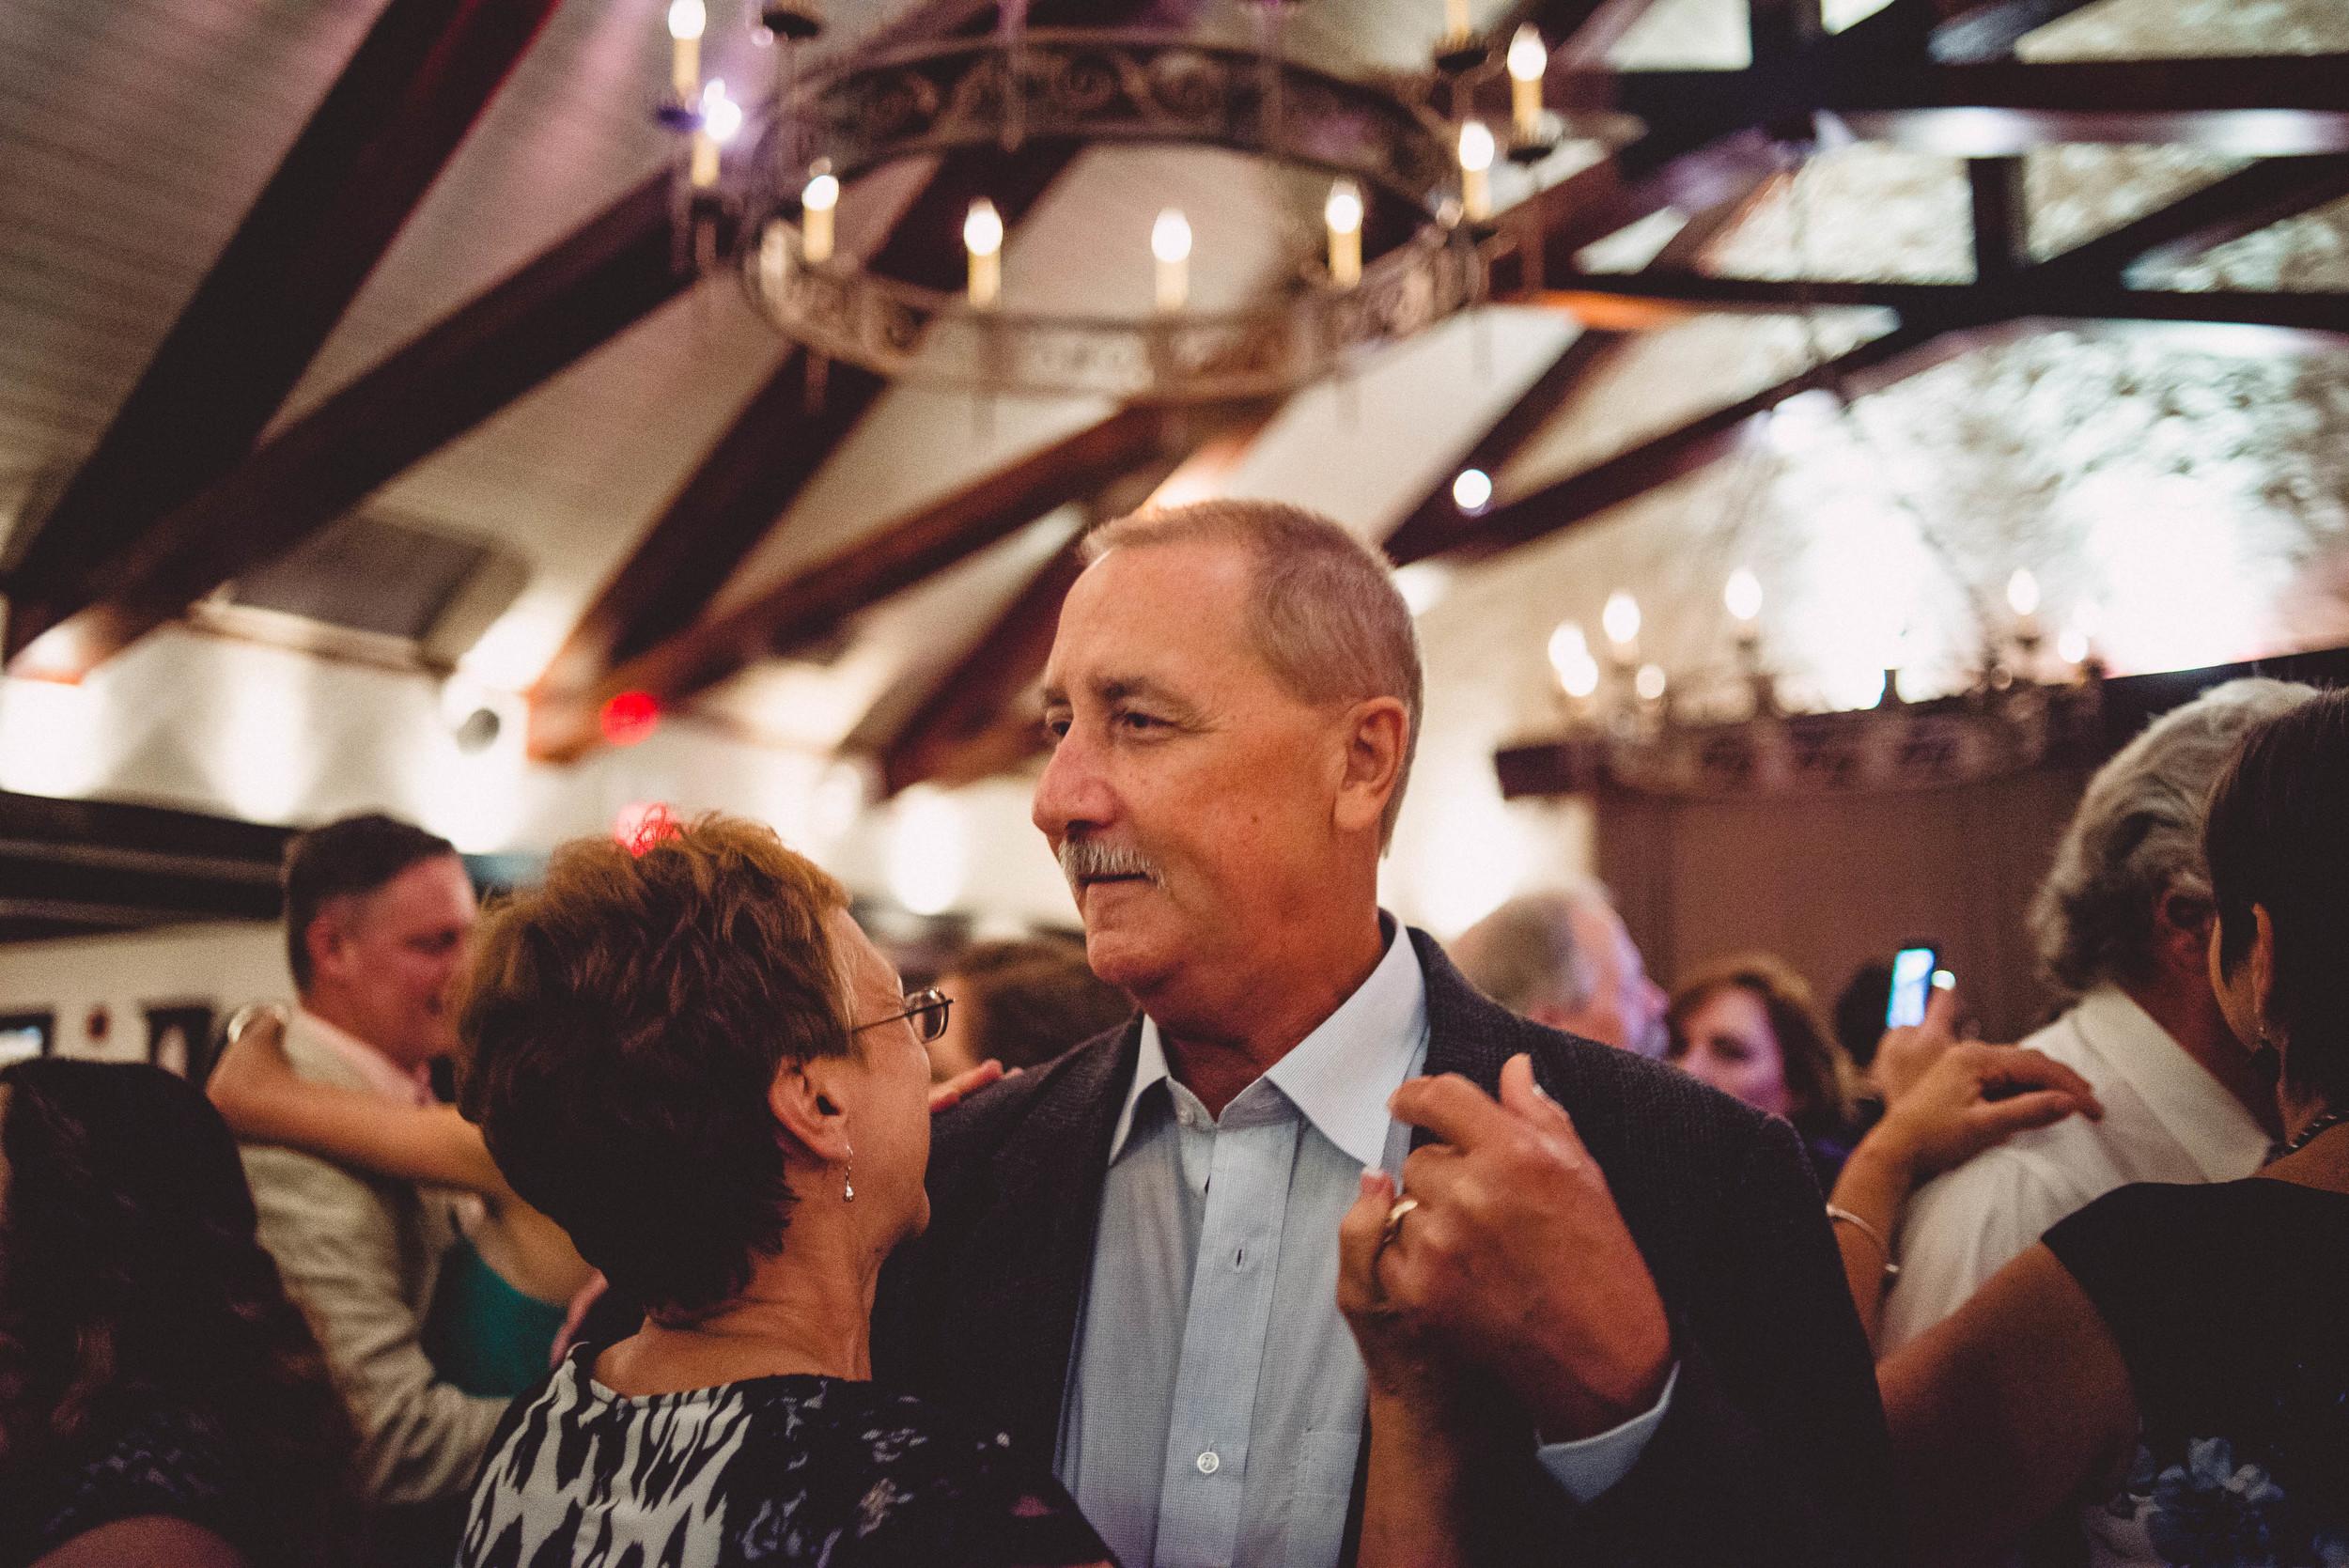 Matt and Shannon Wedding-20160730-21-07-29.JPG